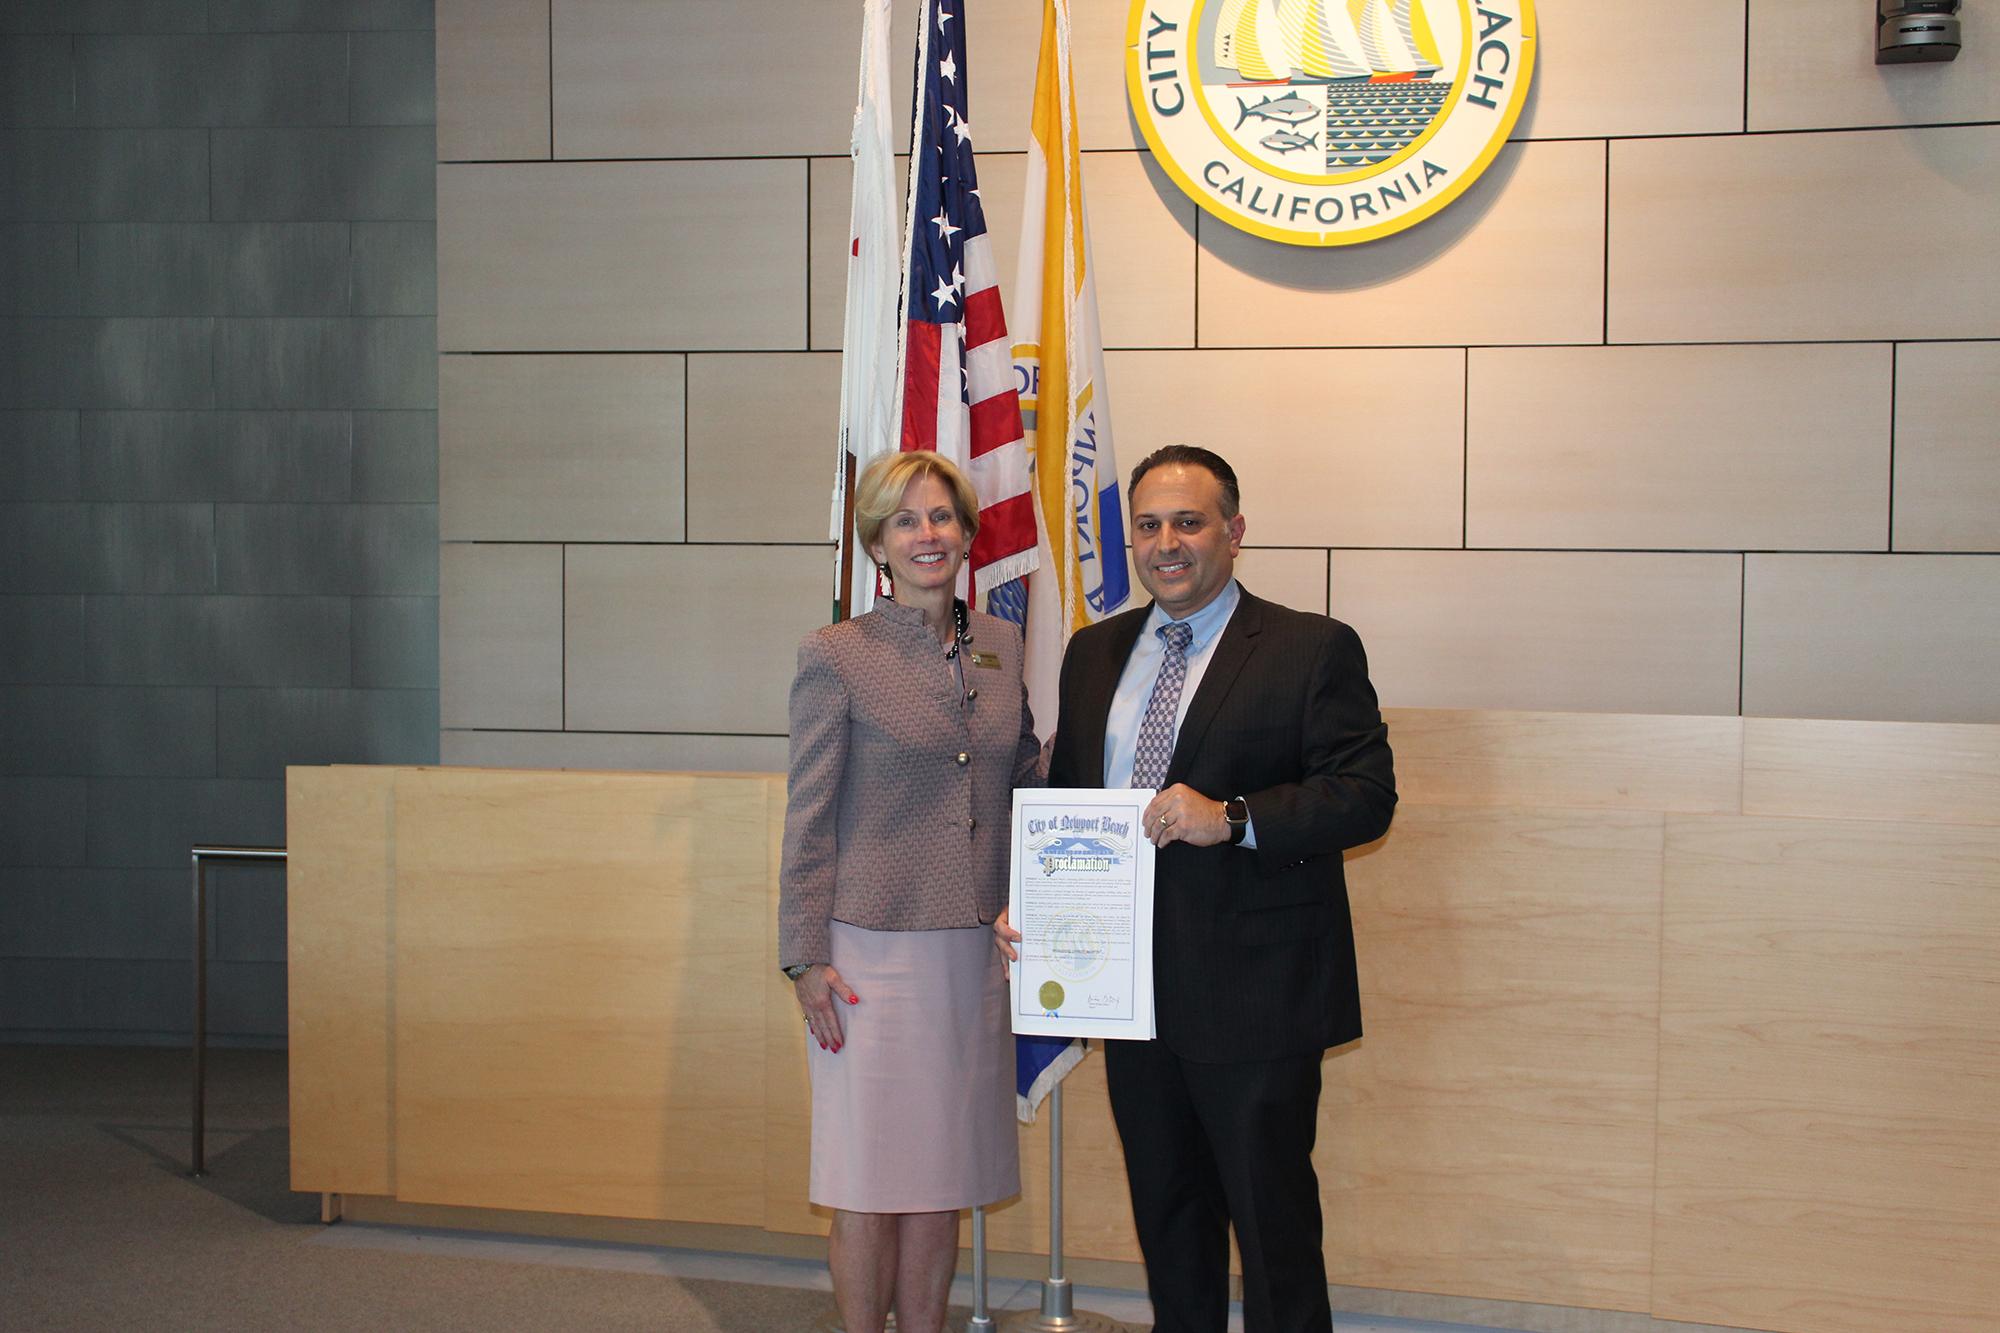 Newport Beach Bldg Official with Mayor